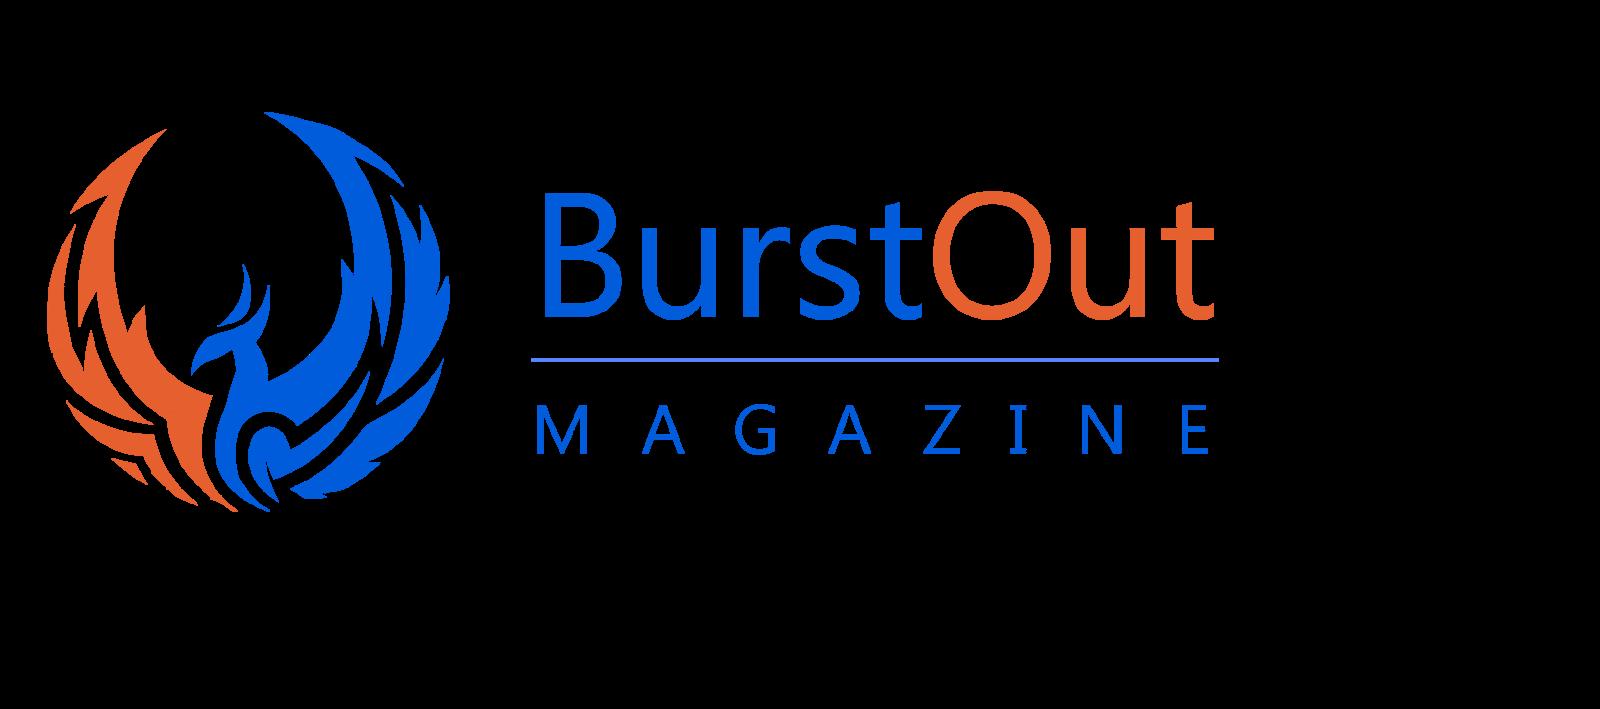 BurstOut Magazine